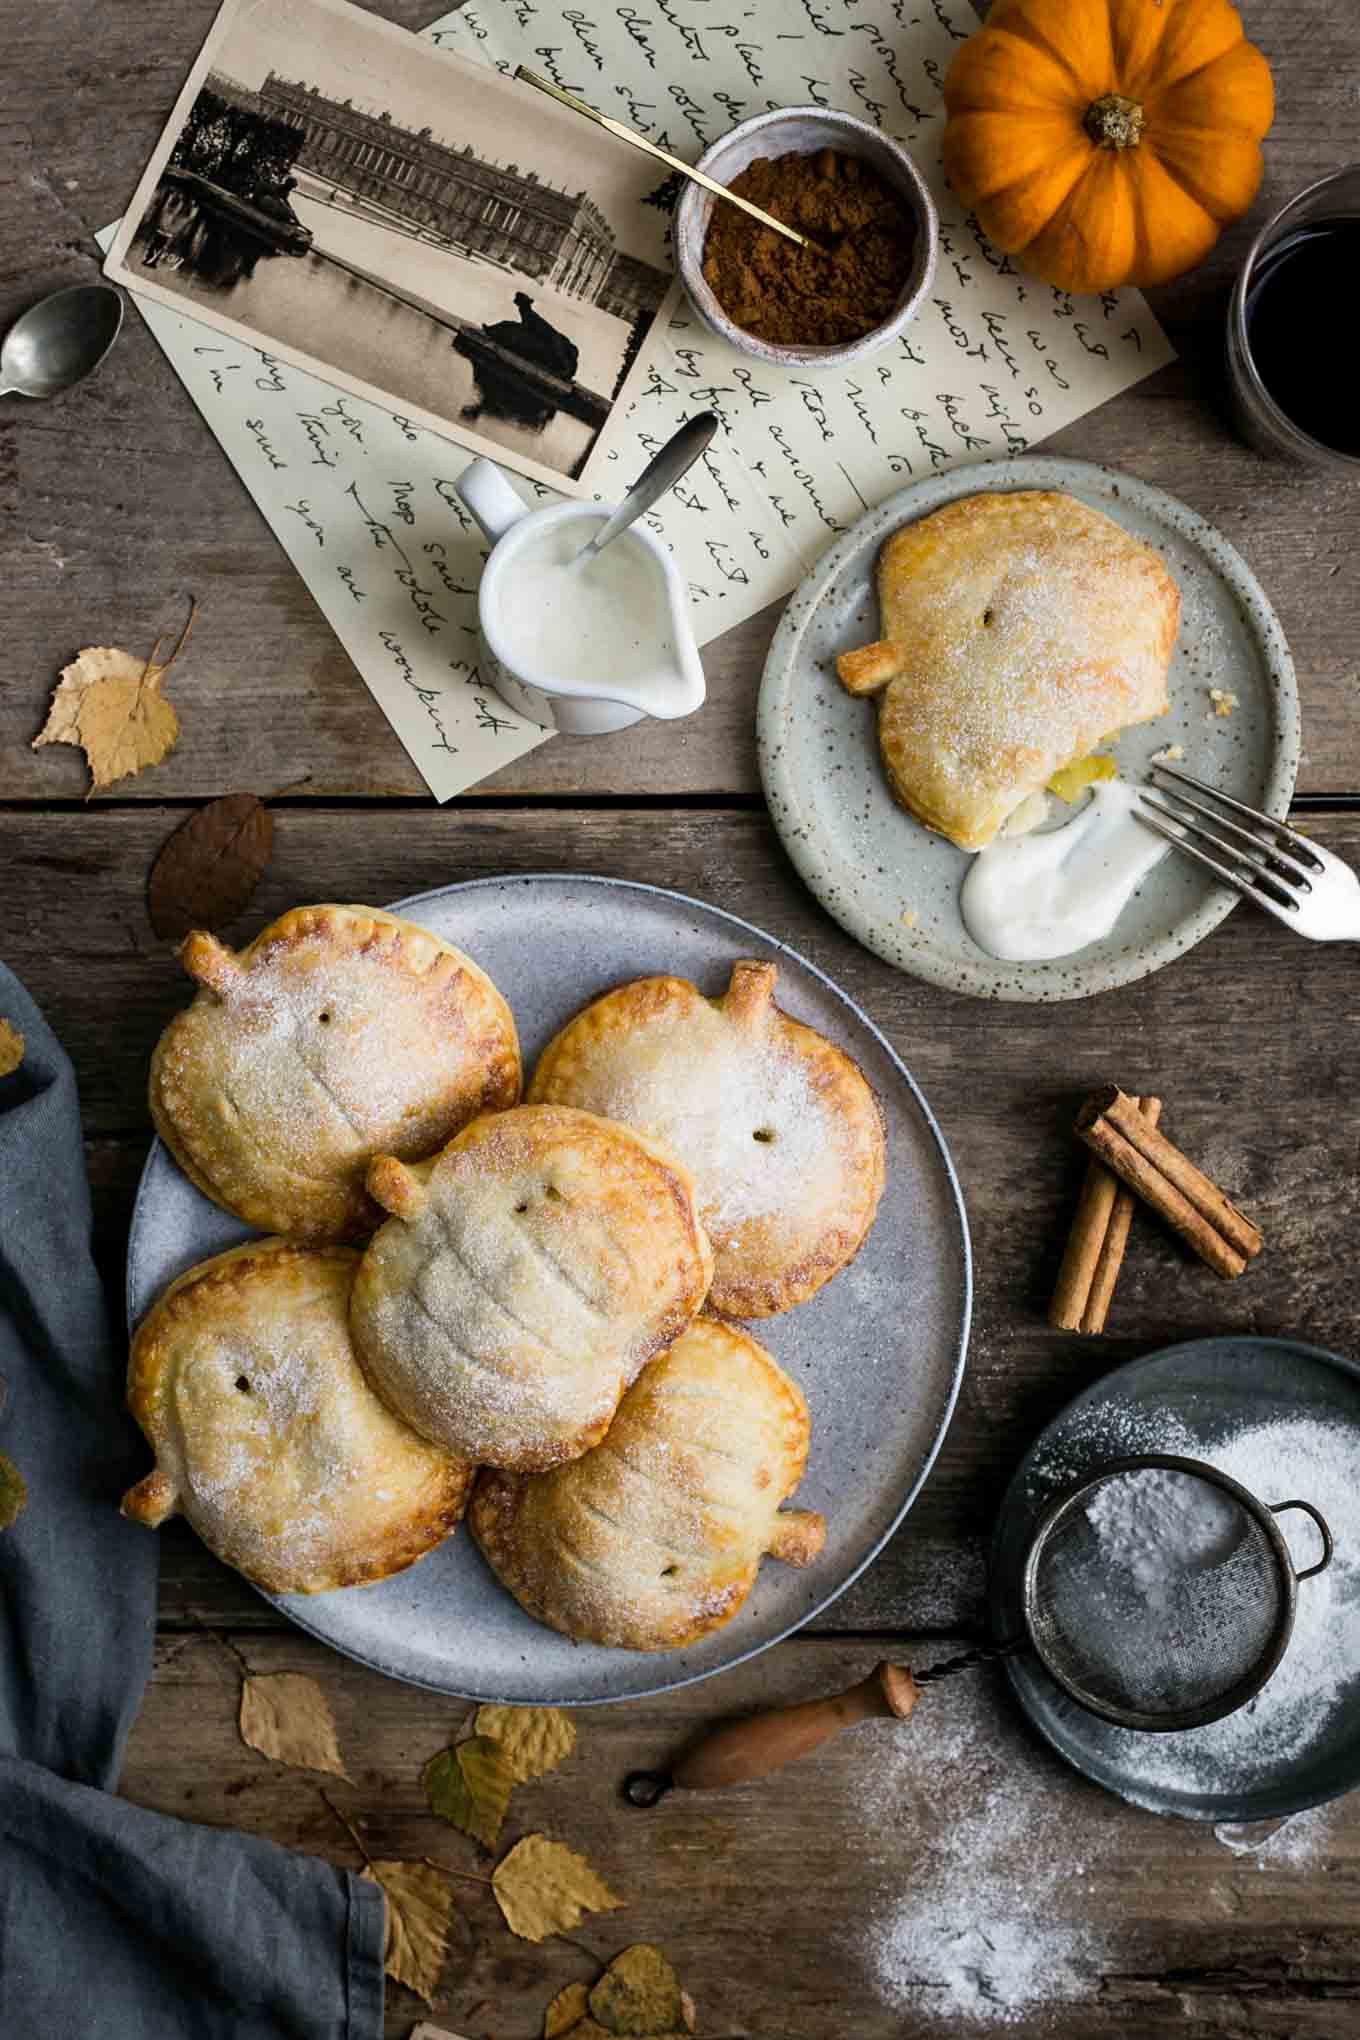 Spiced apple and pumpkin mini- pies #vegan #vegetarian   via @annabanana.co